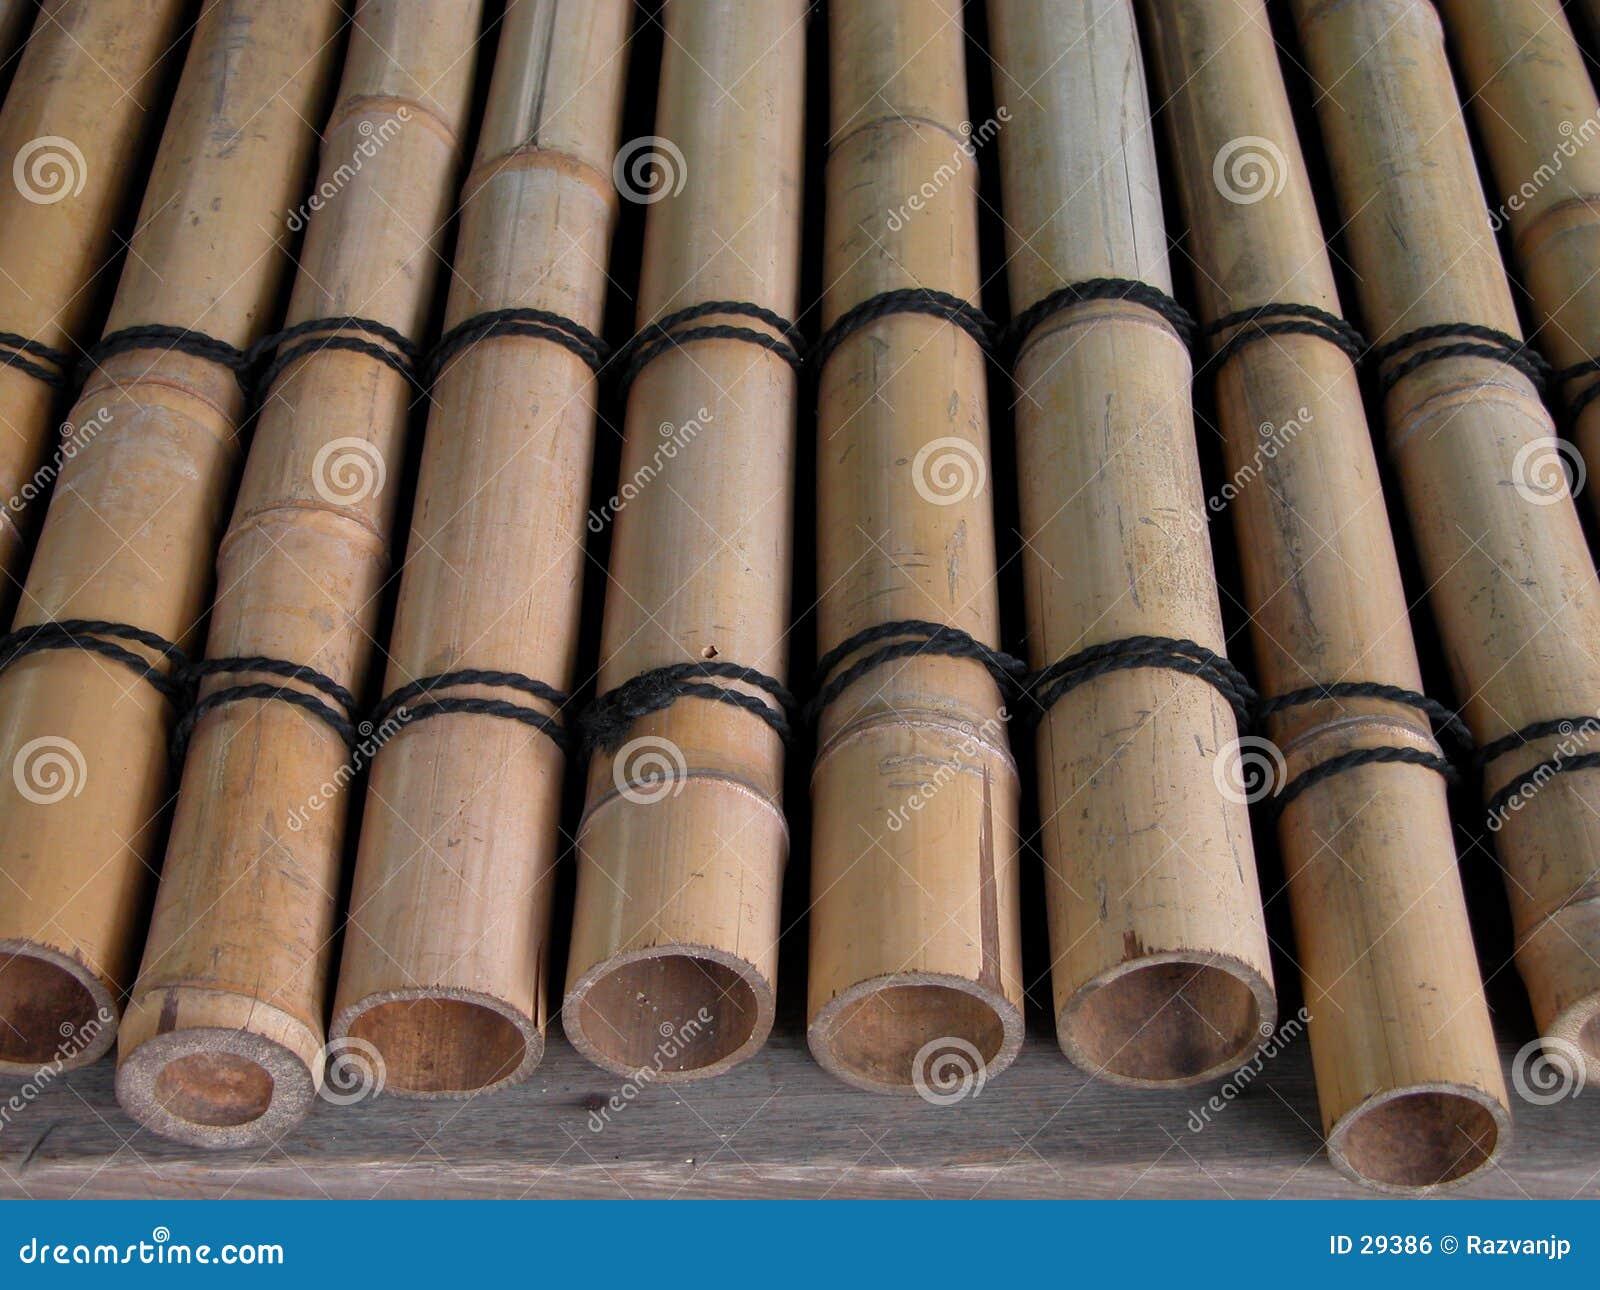 Stropnicy bambusowe